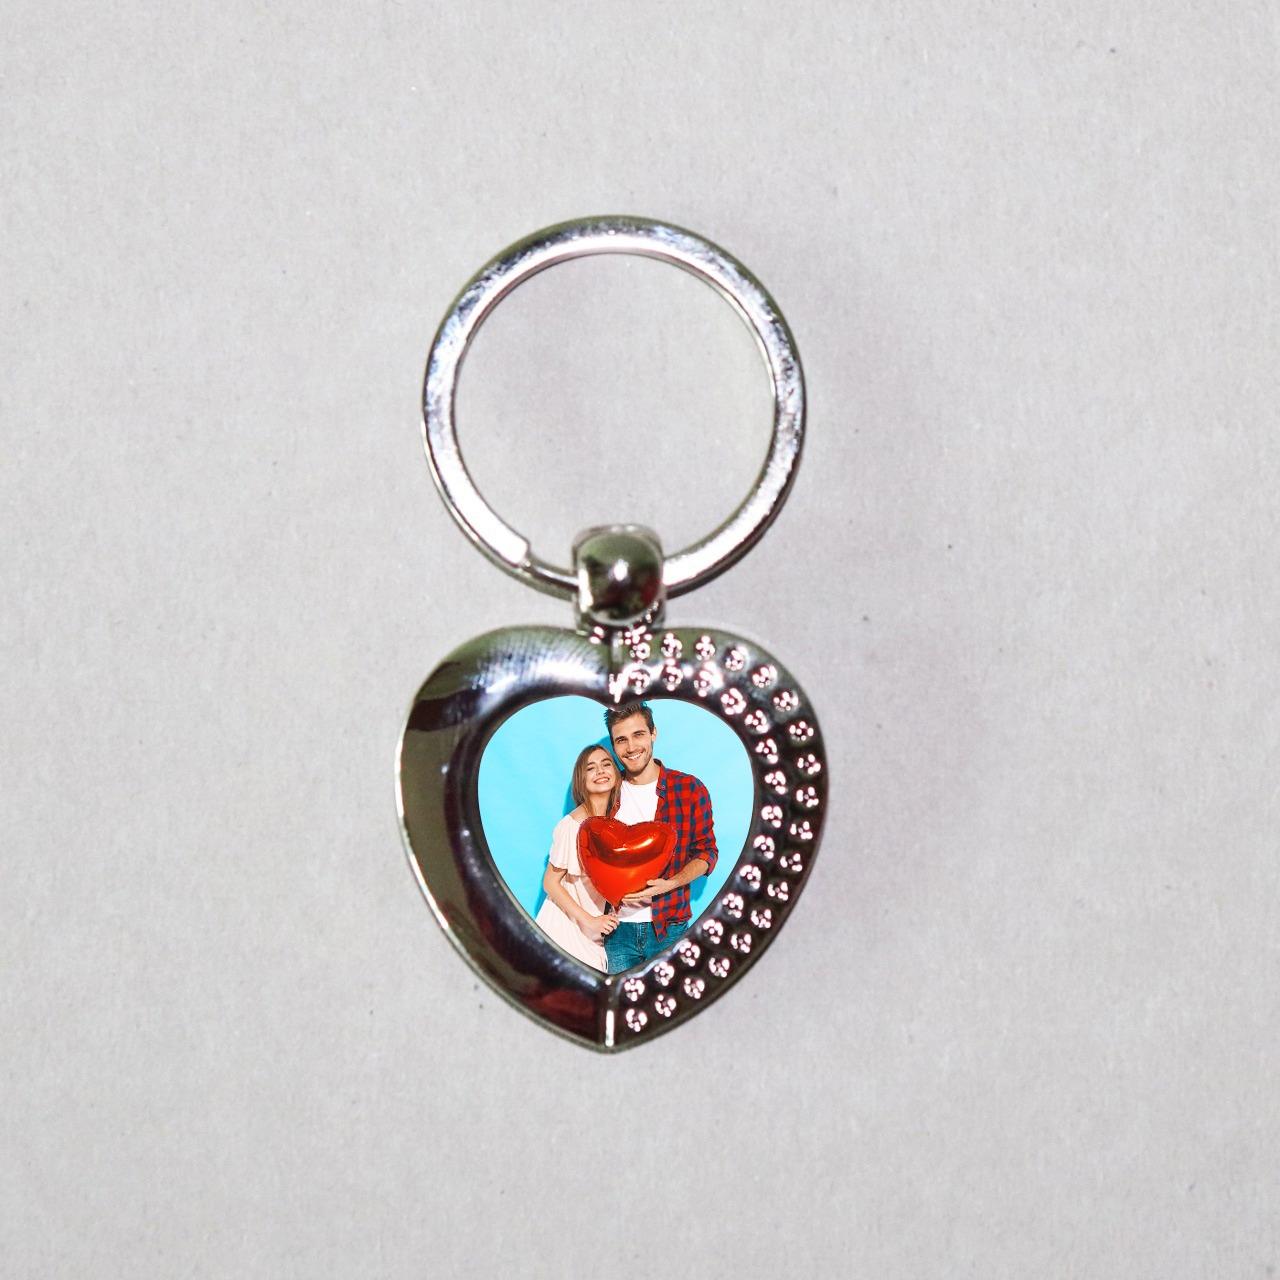 Personalized Heart Key Chain